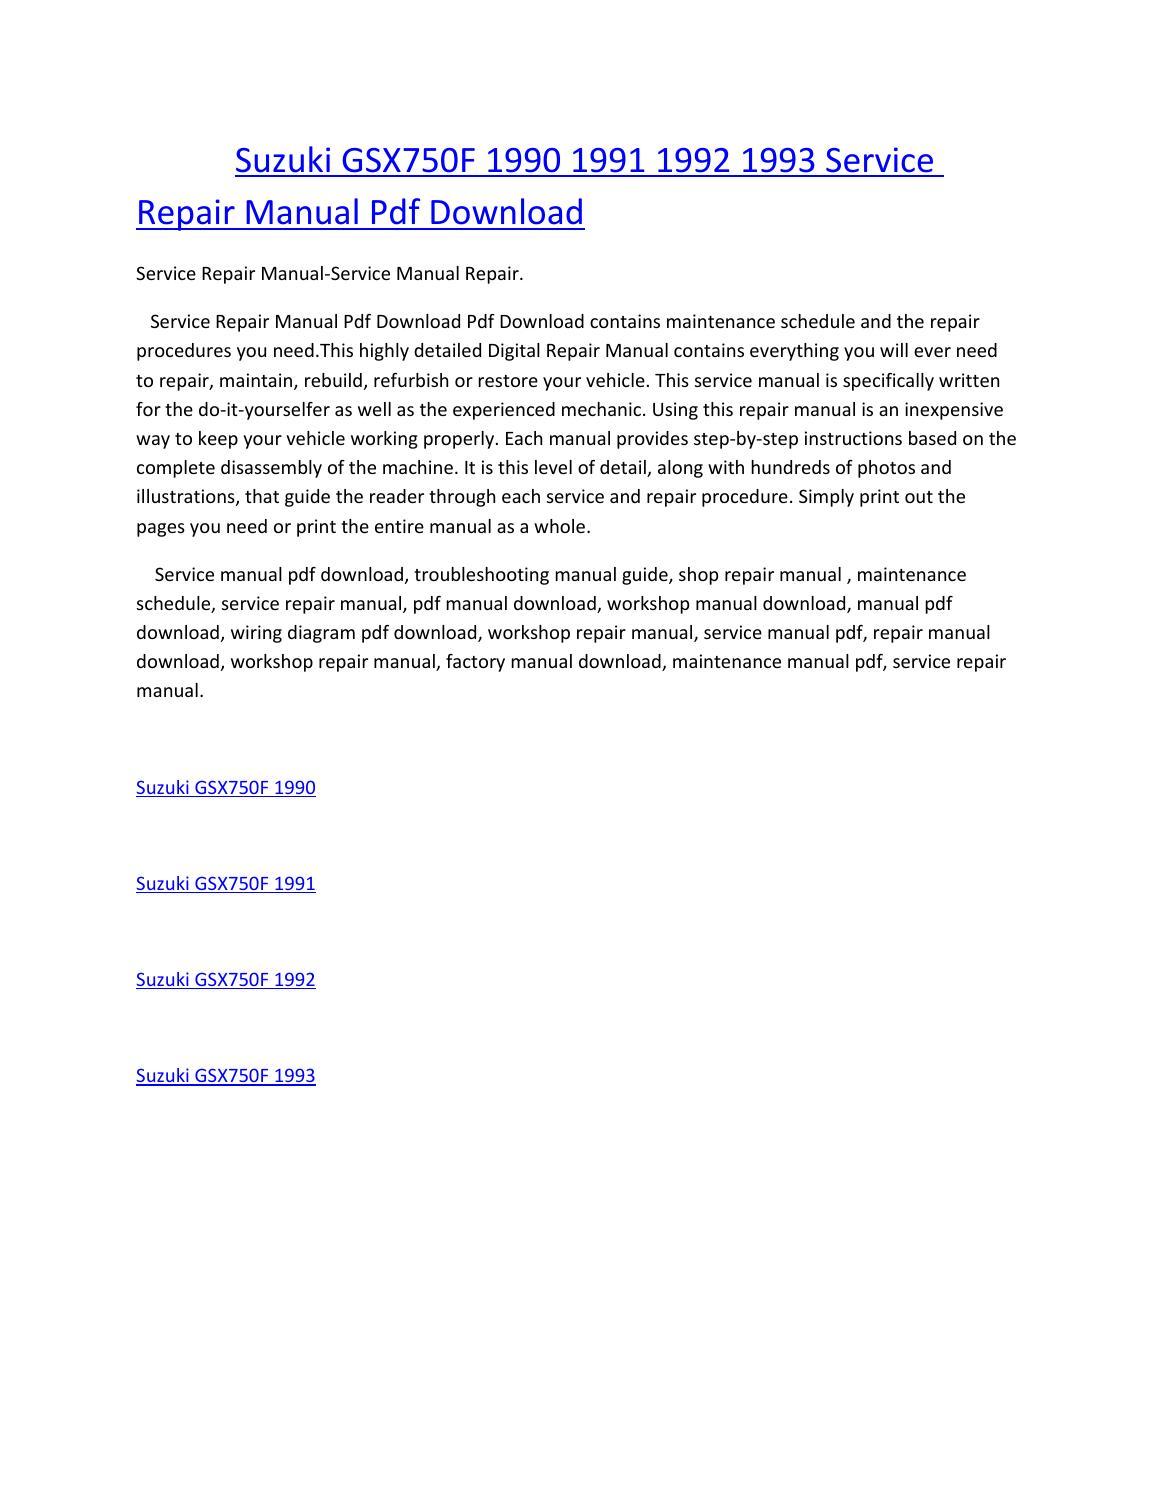 hight resolution of suzuki gsx750f 1990 1991 1992 1993 service manual repair pdf download